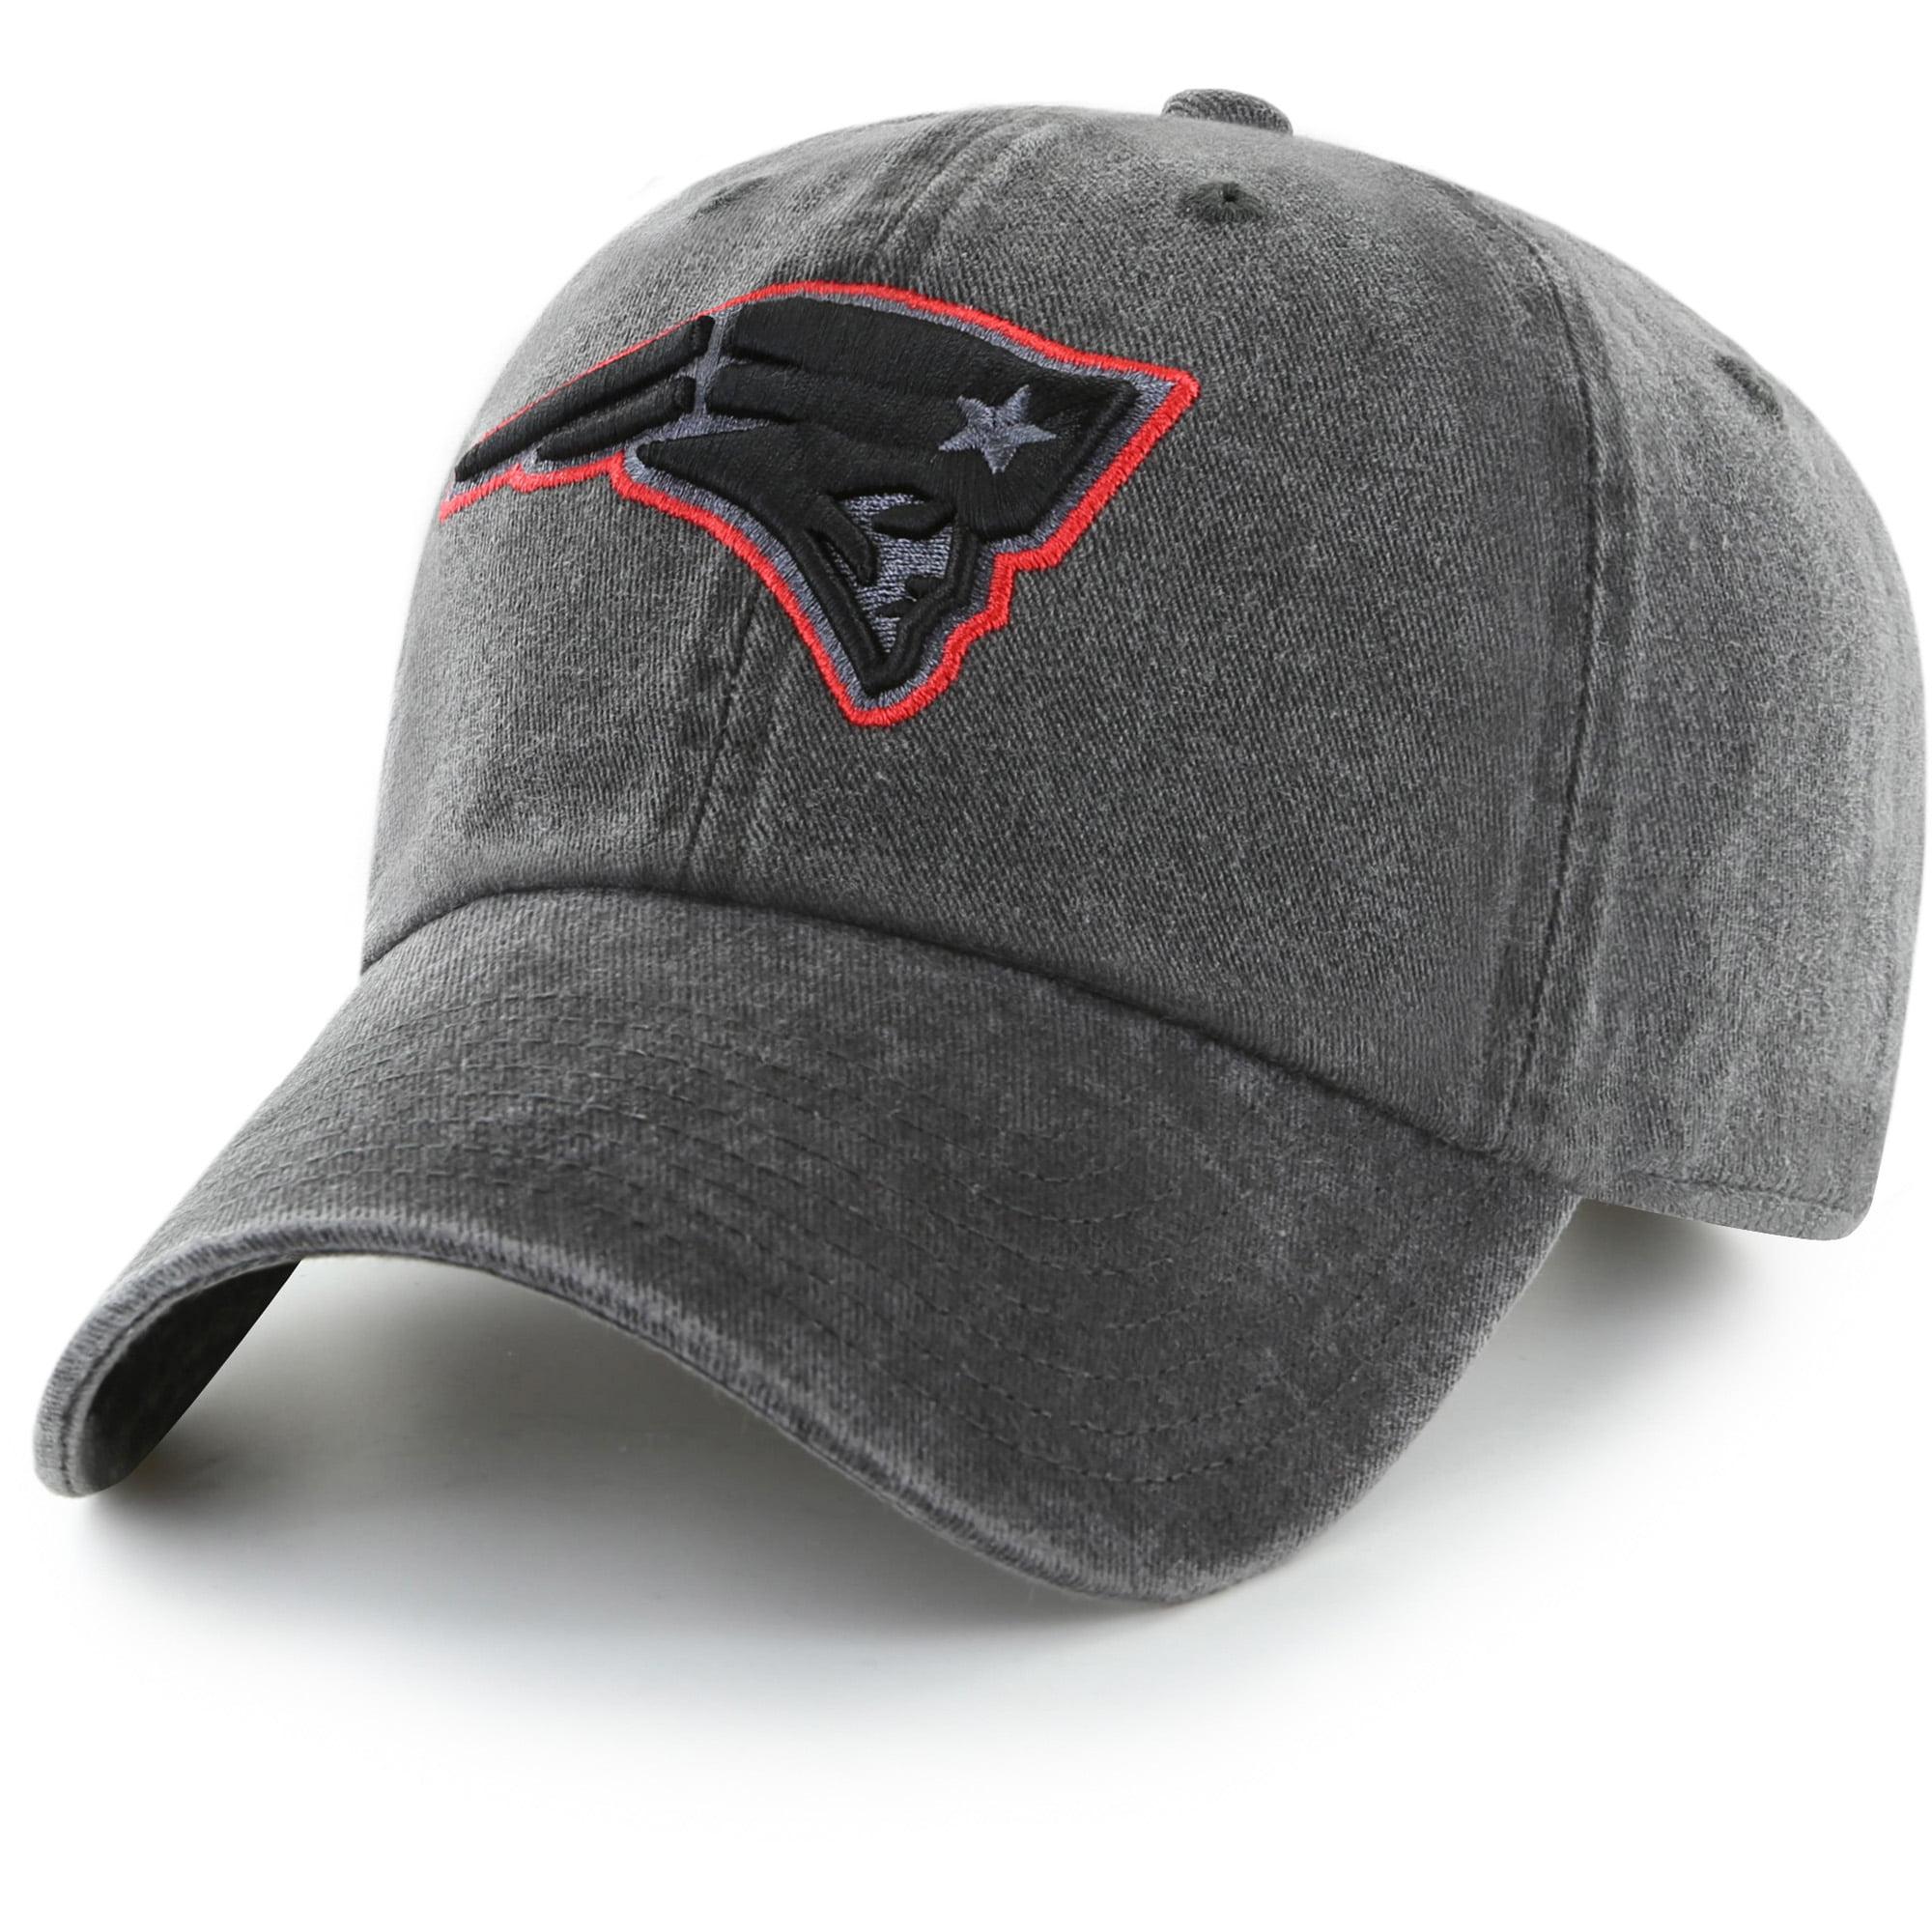 Men's Fan Favorite Black New England Patriots Mass Matter Adjustable Hat - OSFA